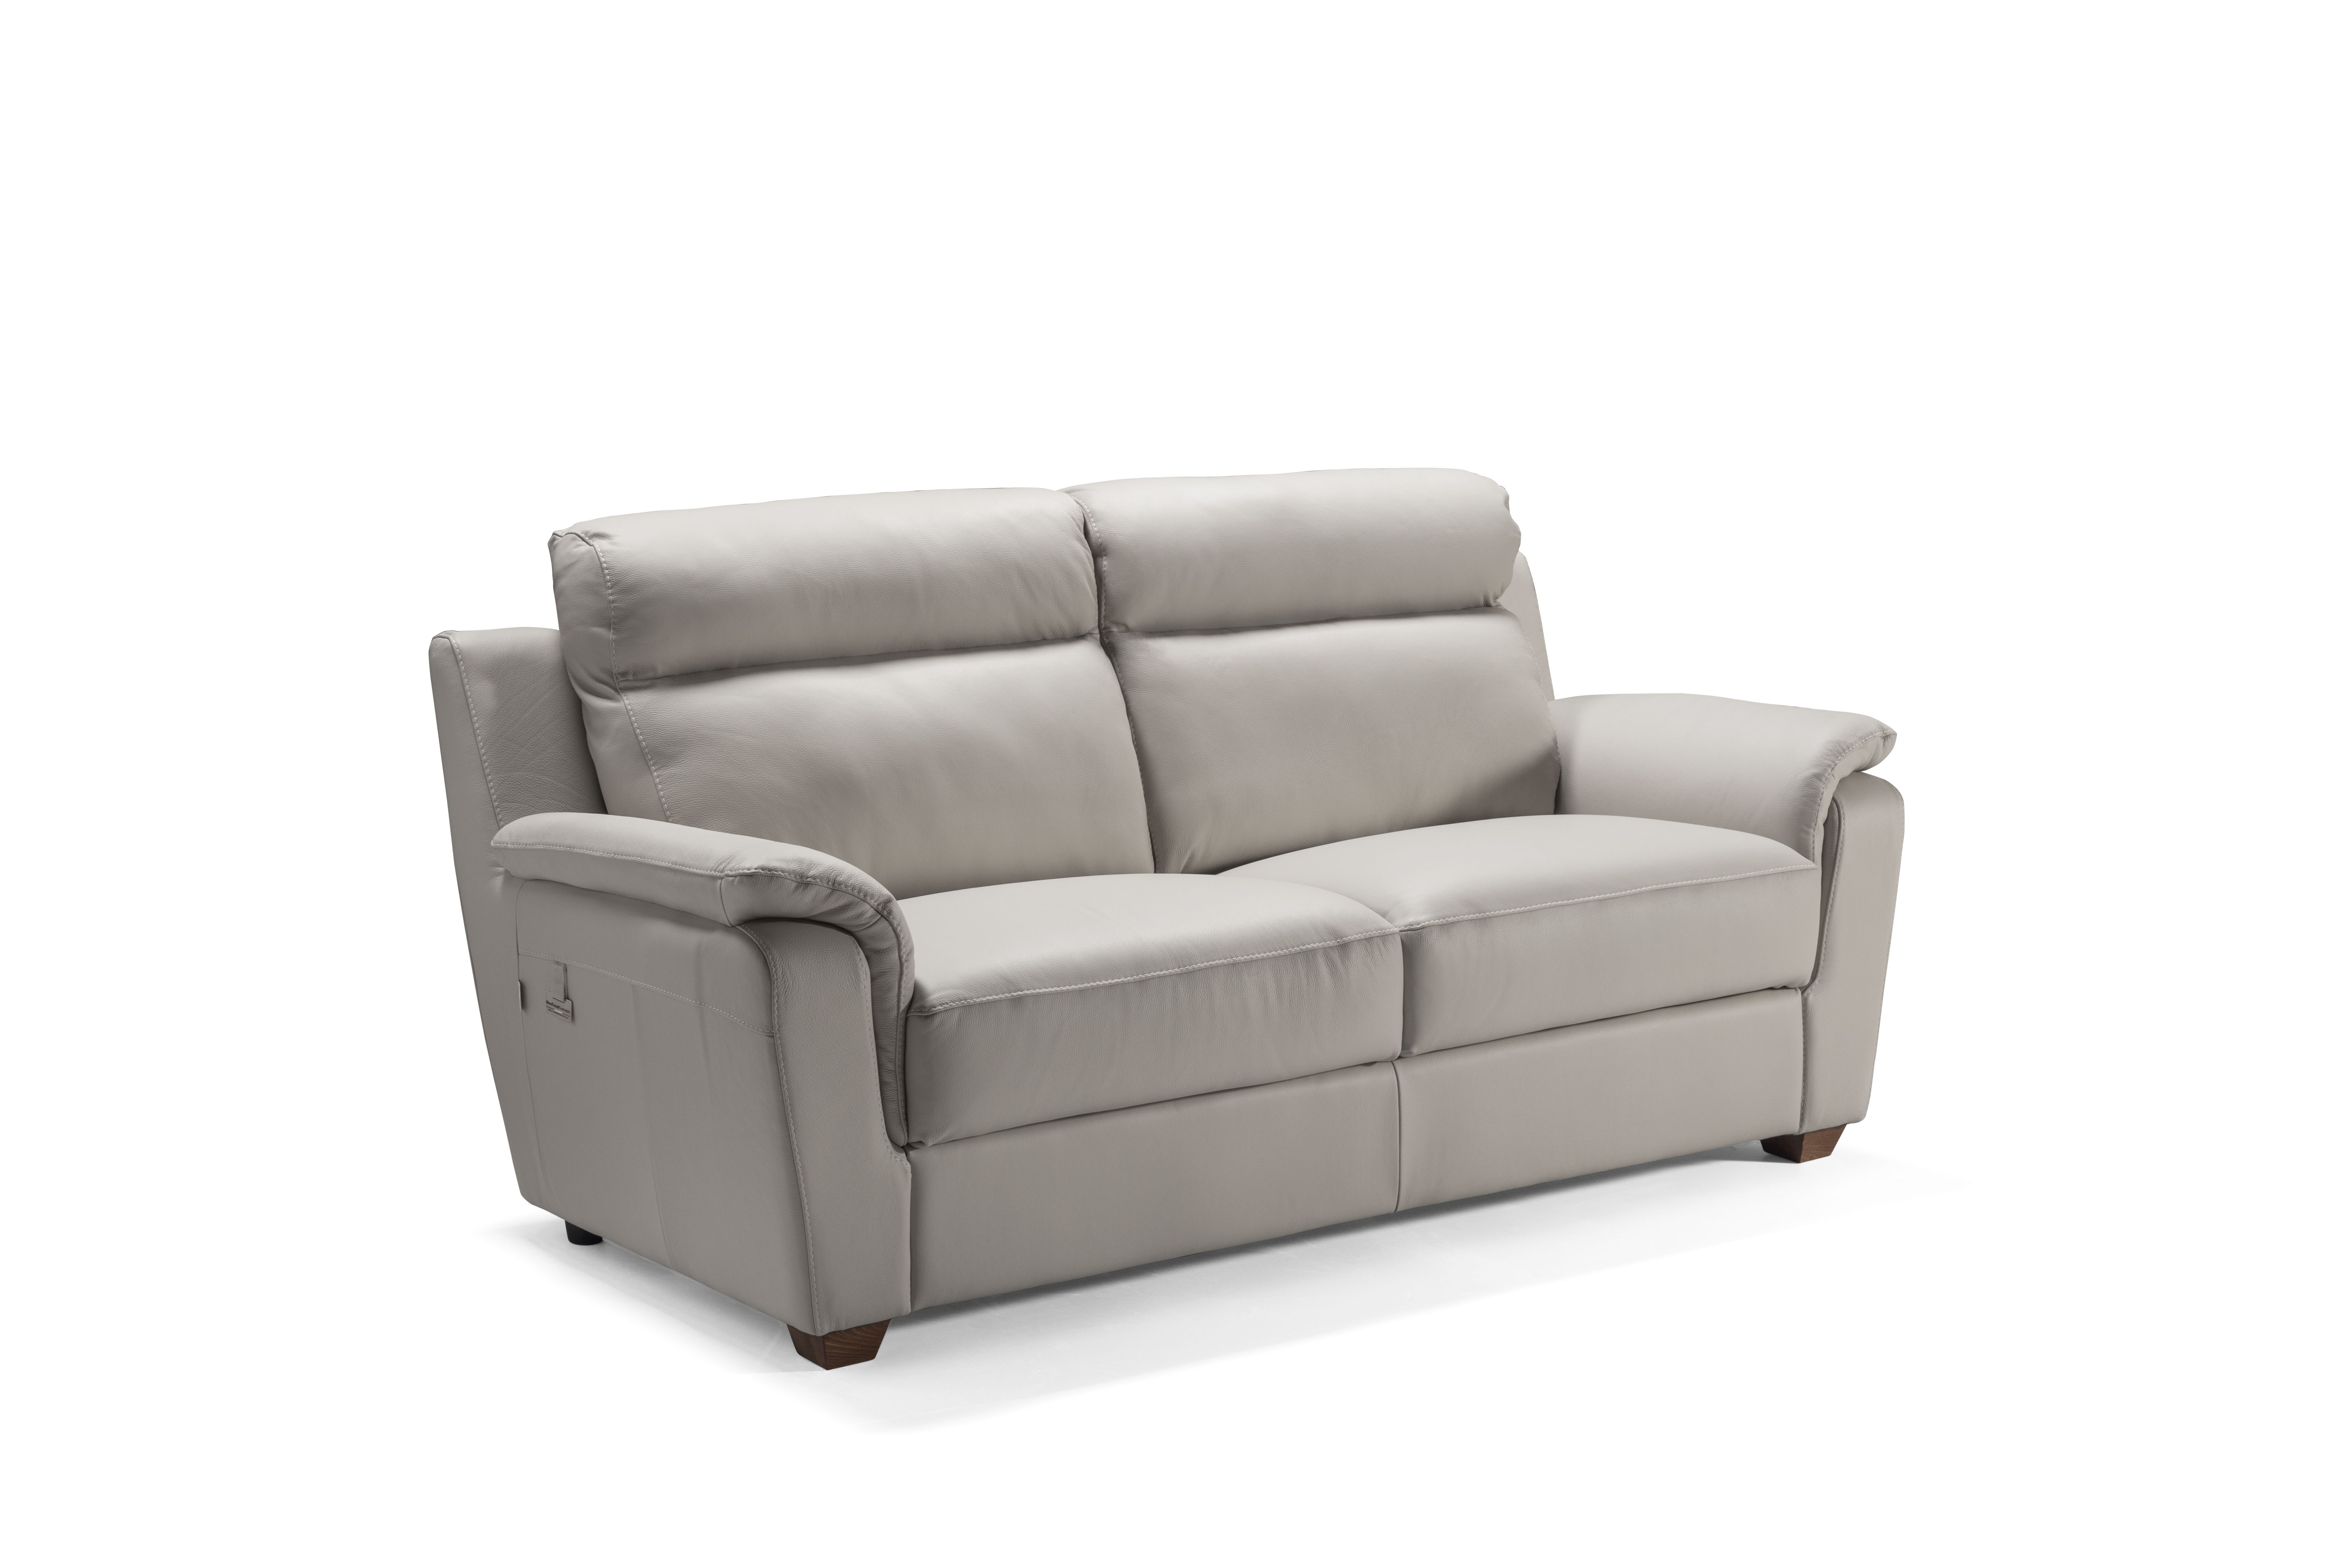 EDNA Italian Leather 3 & 2 Seat Sofas - Light Grey Cenere. RRP £3399 - Image 2 of 4